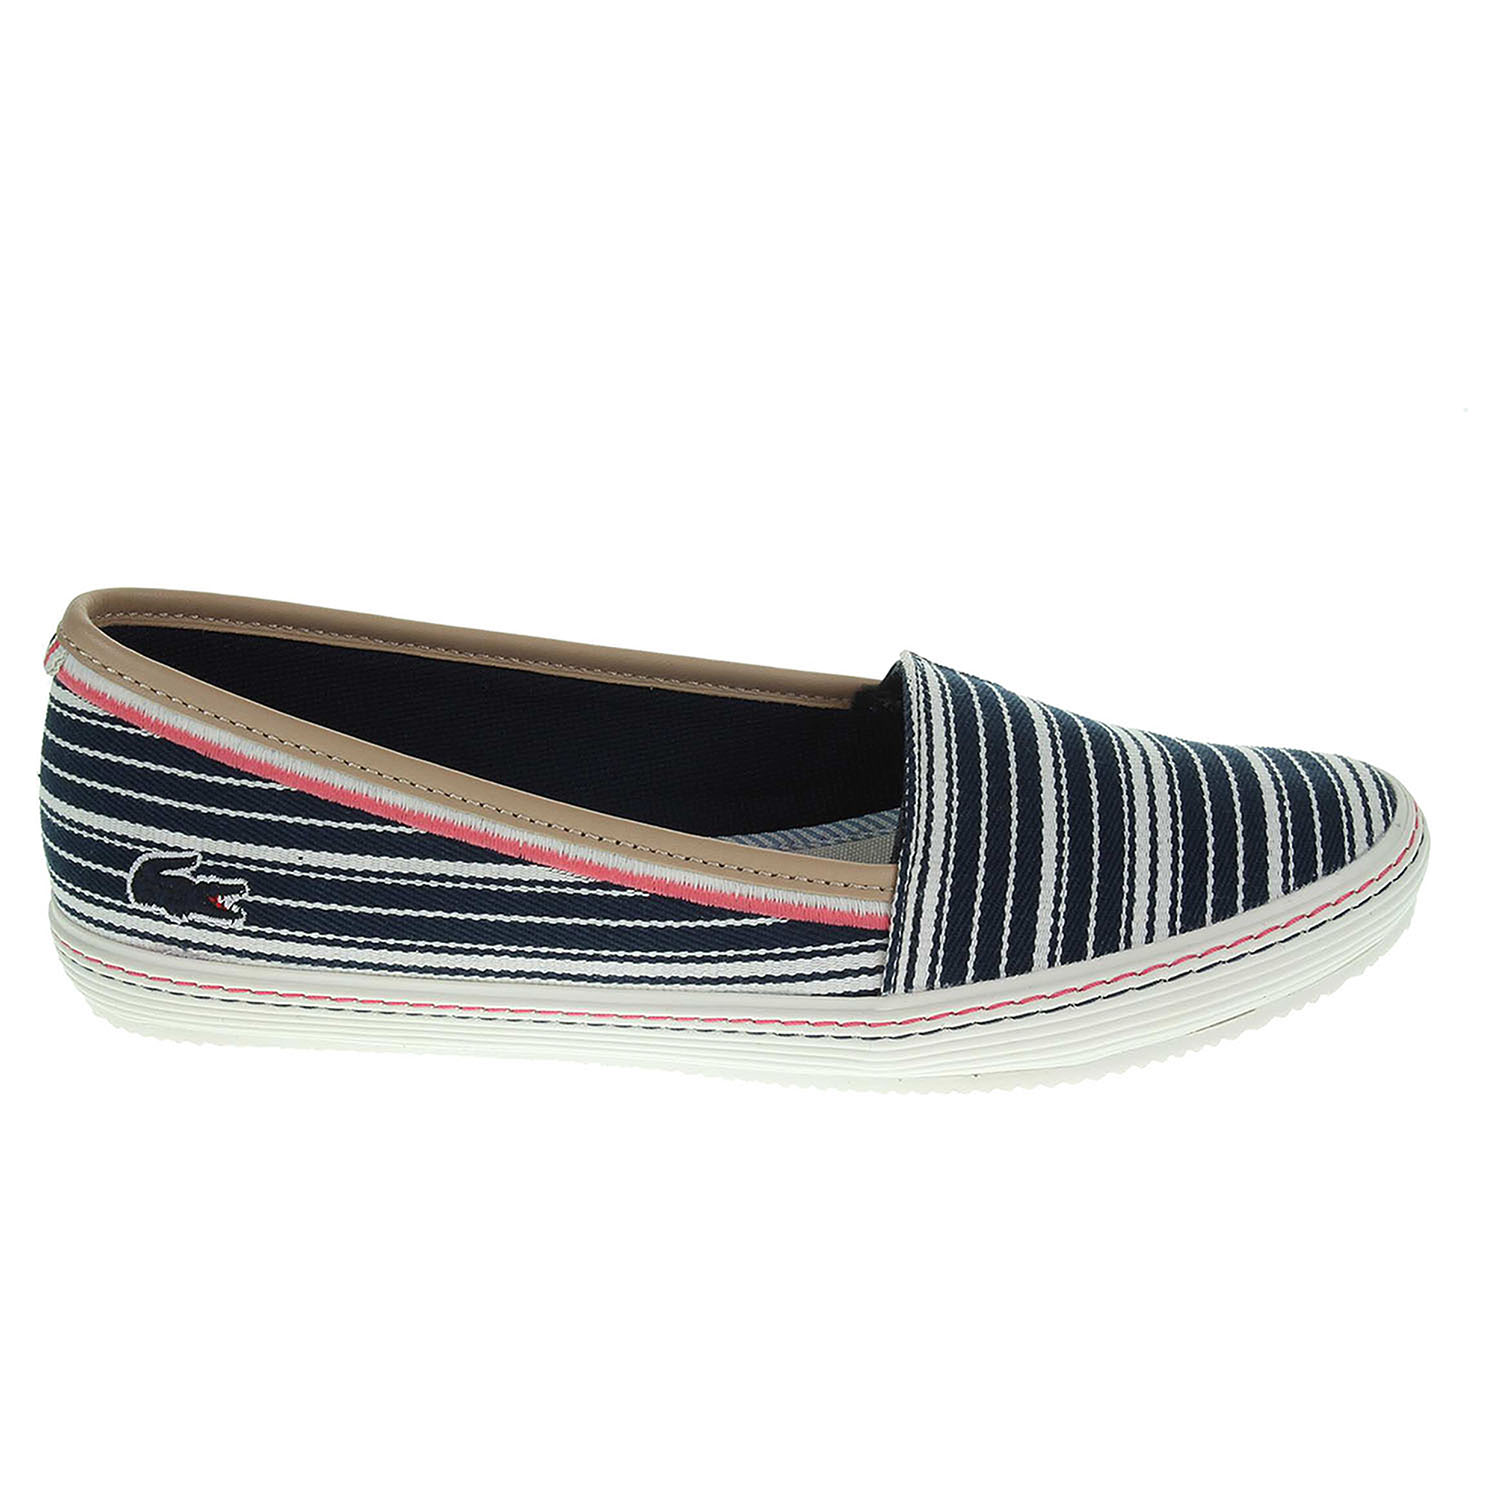 Lacoste Orane dámská obuv modrá 38 modrá modrá